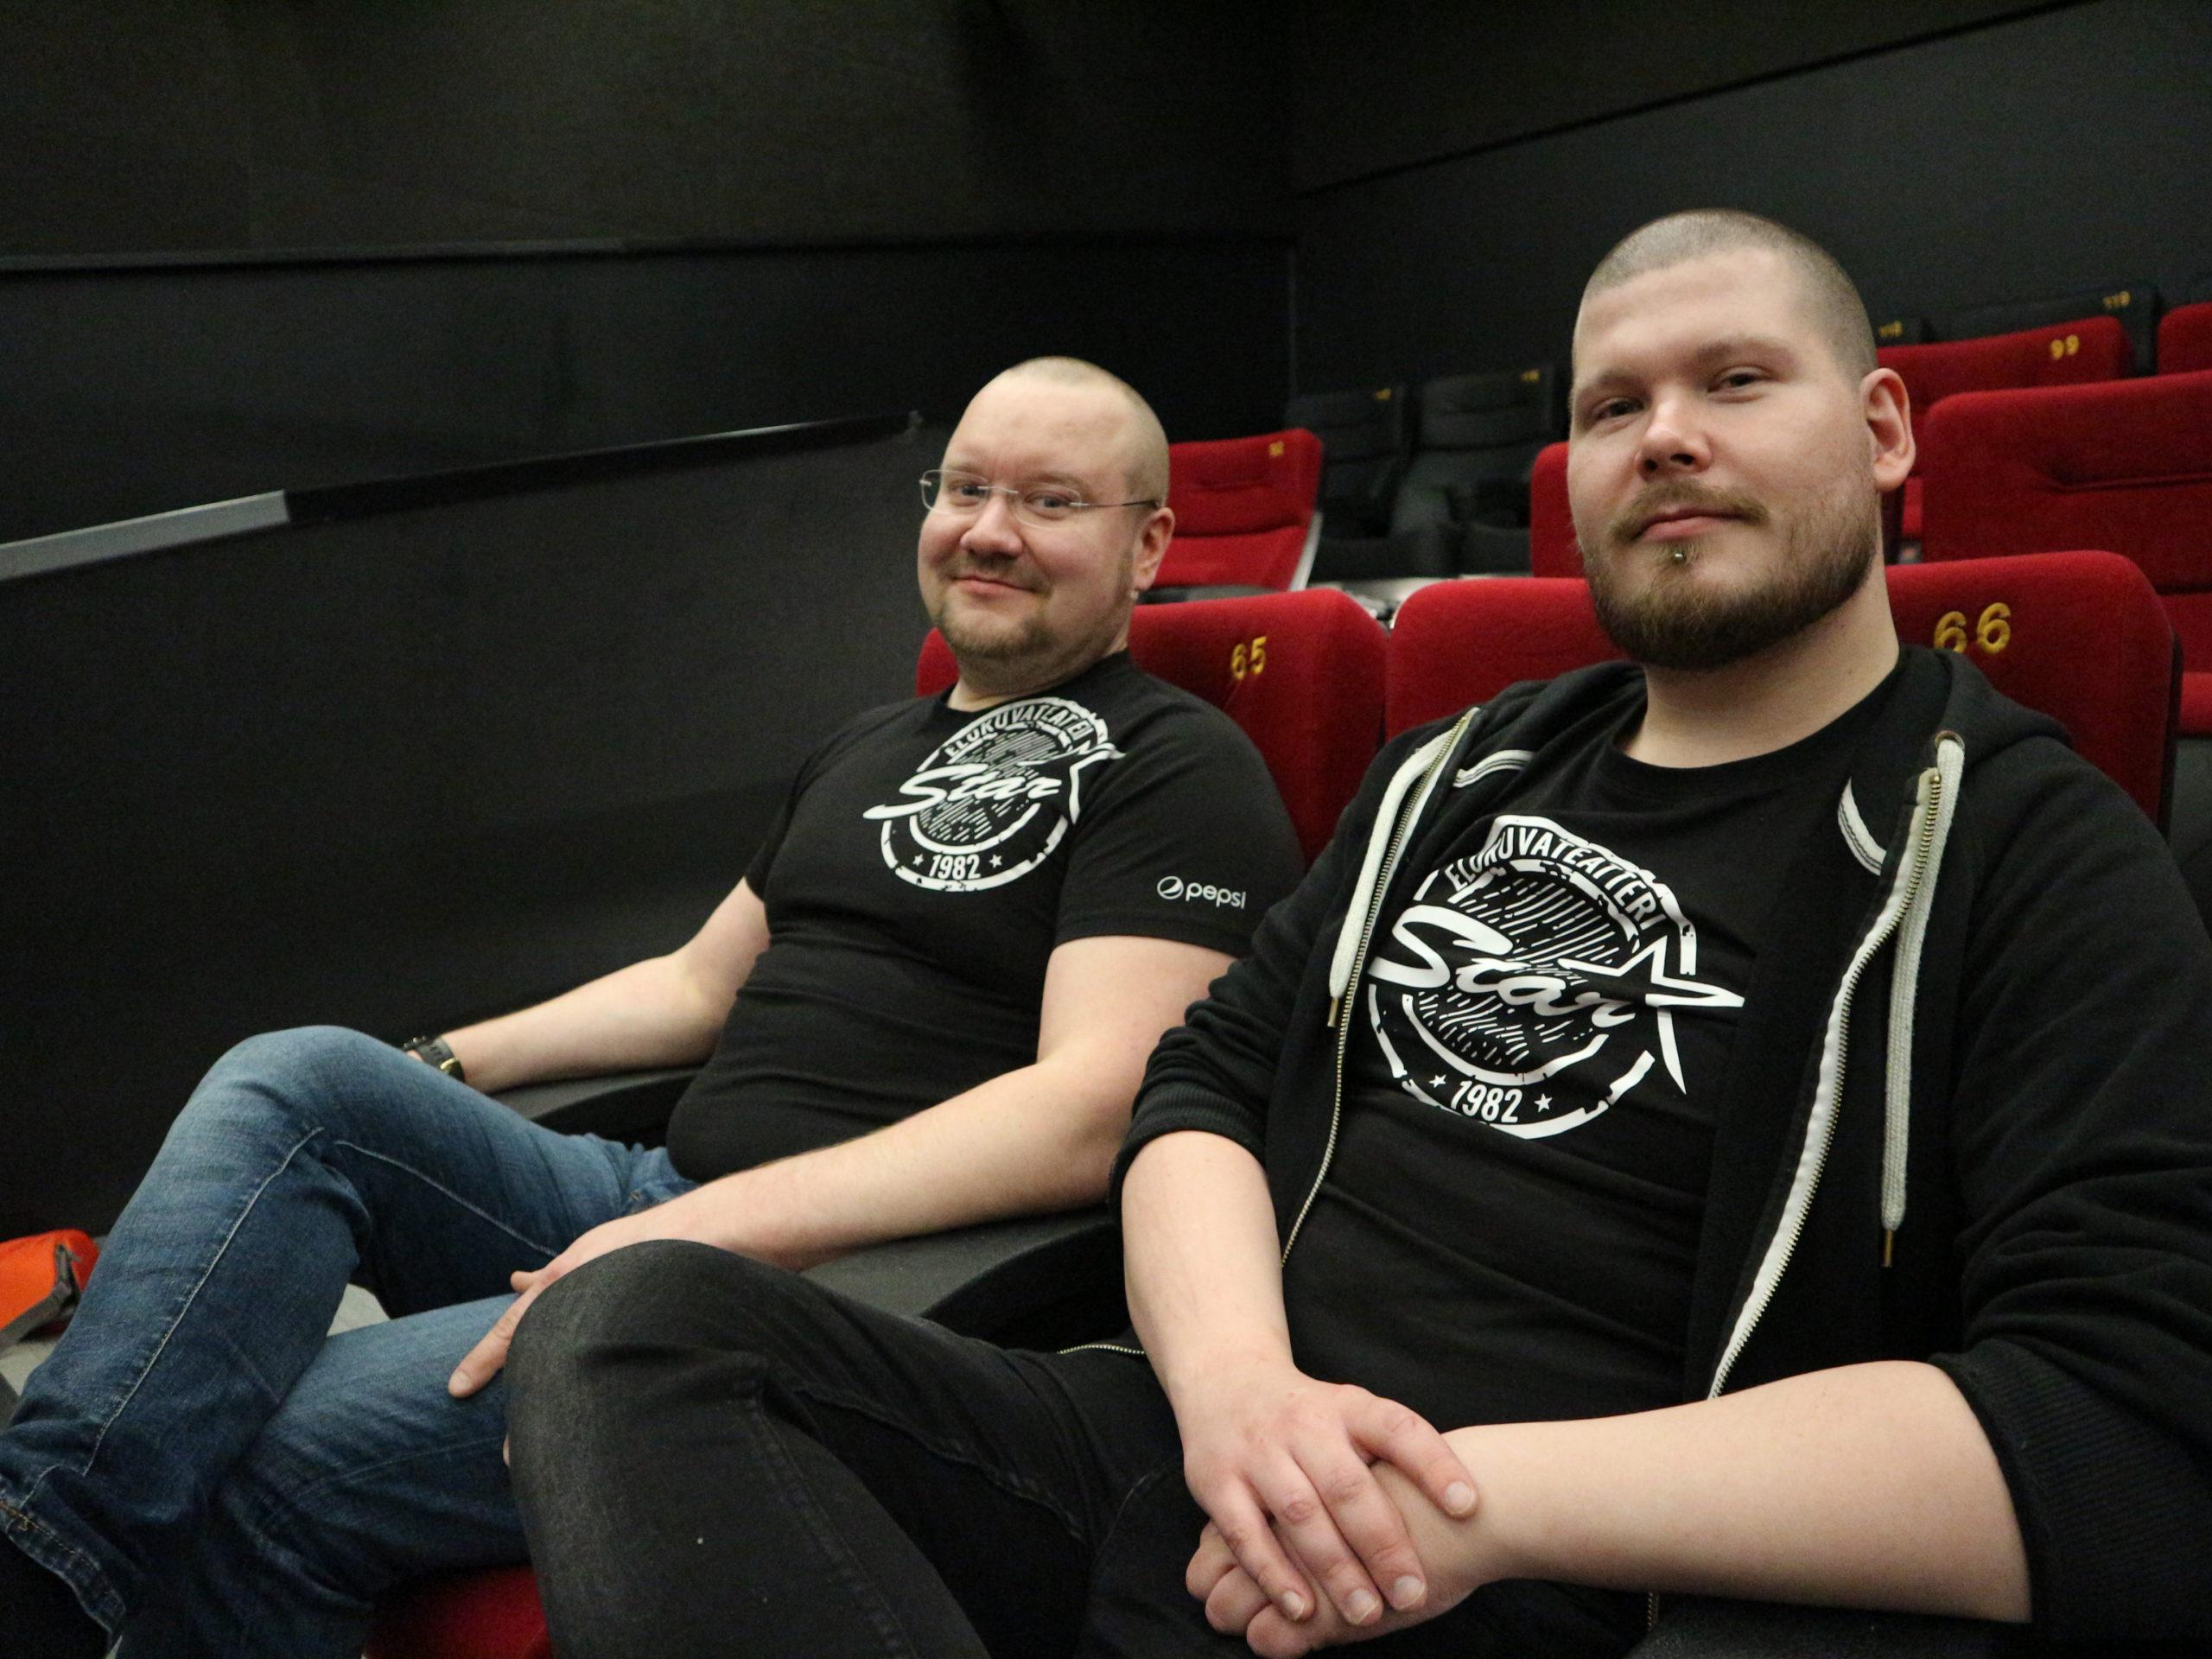 Elokuvateatteri Star